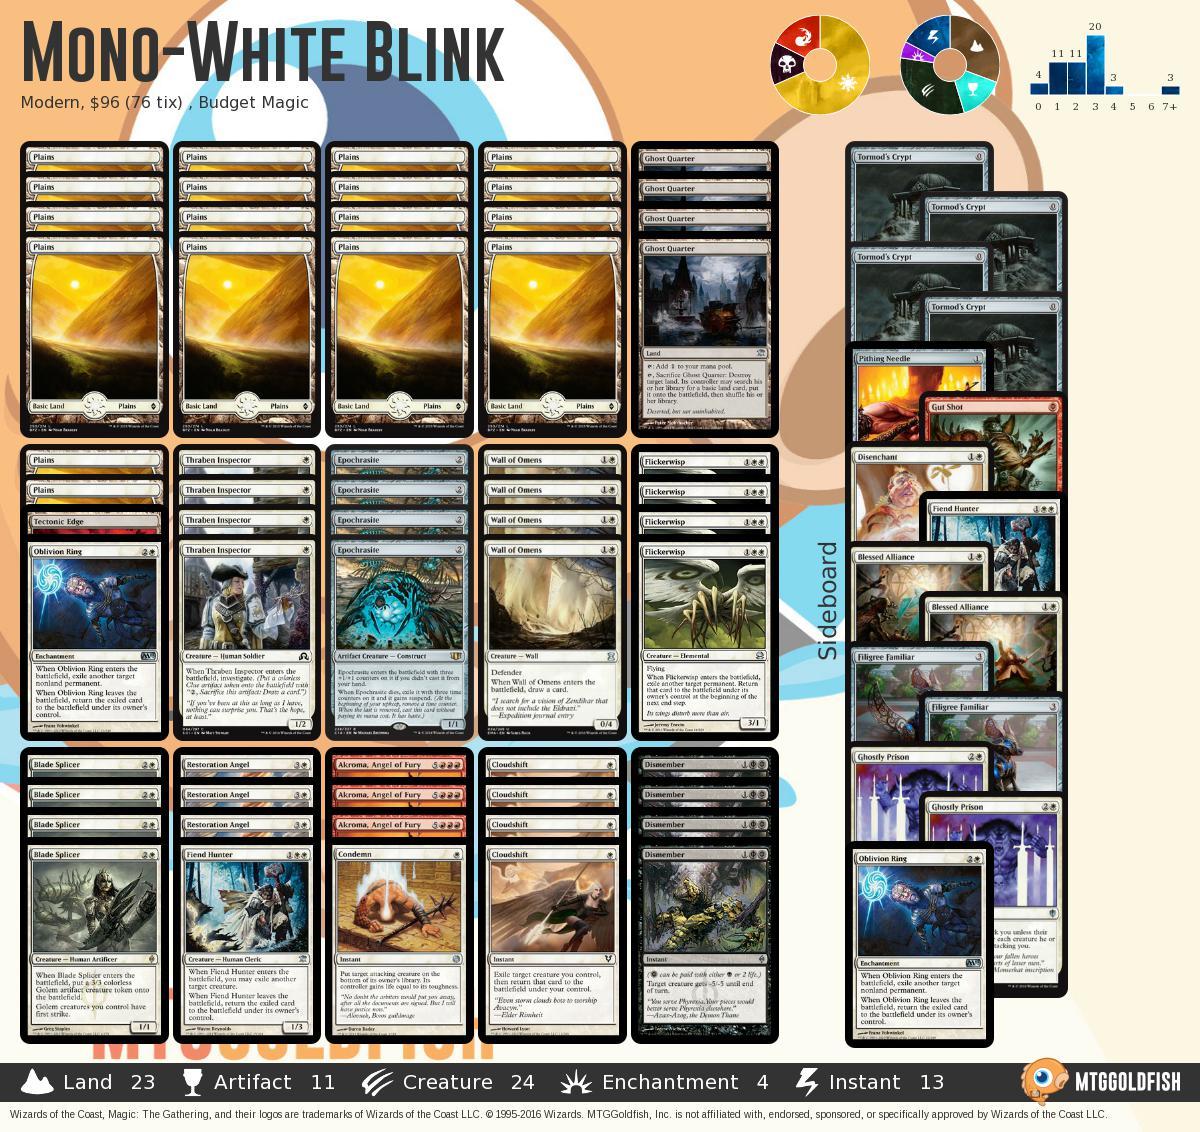 Mono white%2bblink 8e689cb0 c23c 4d27 a743 9c50e1658773%2ejpg